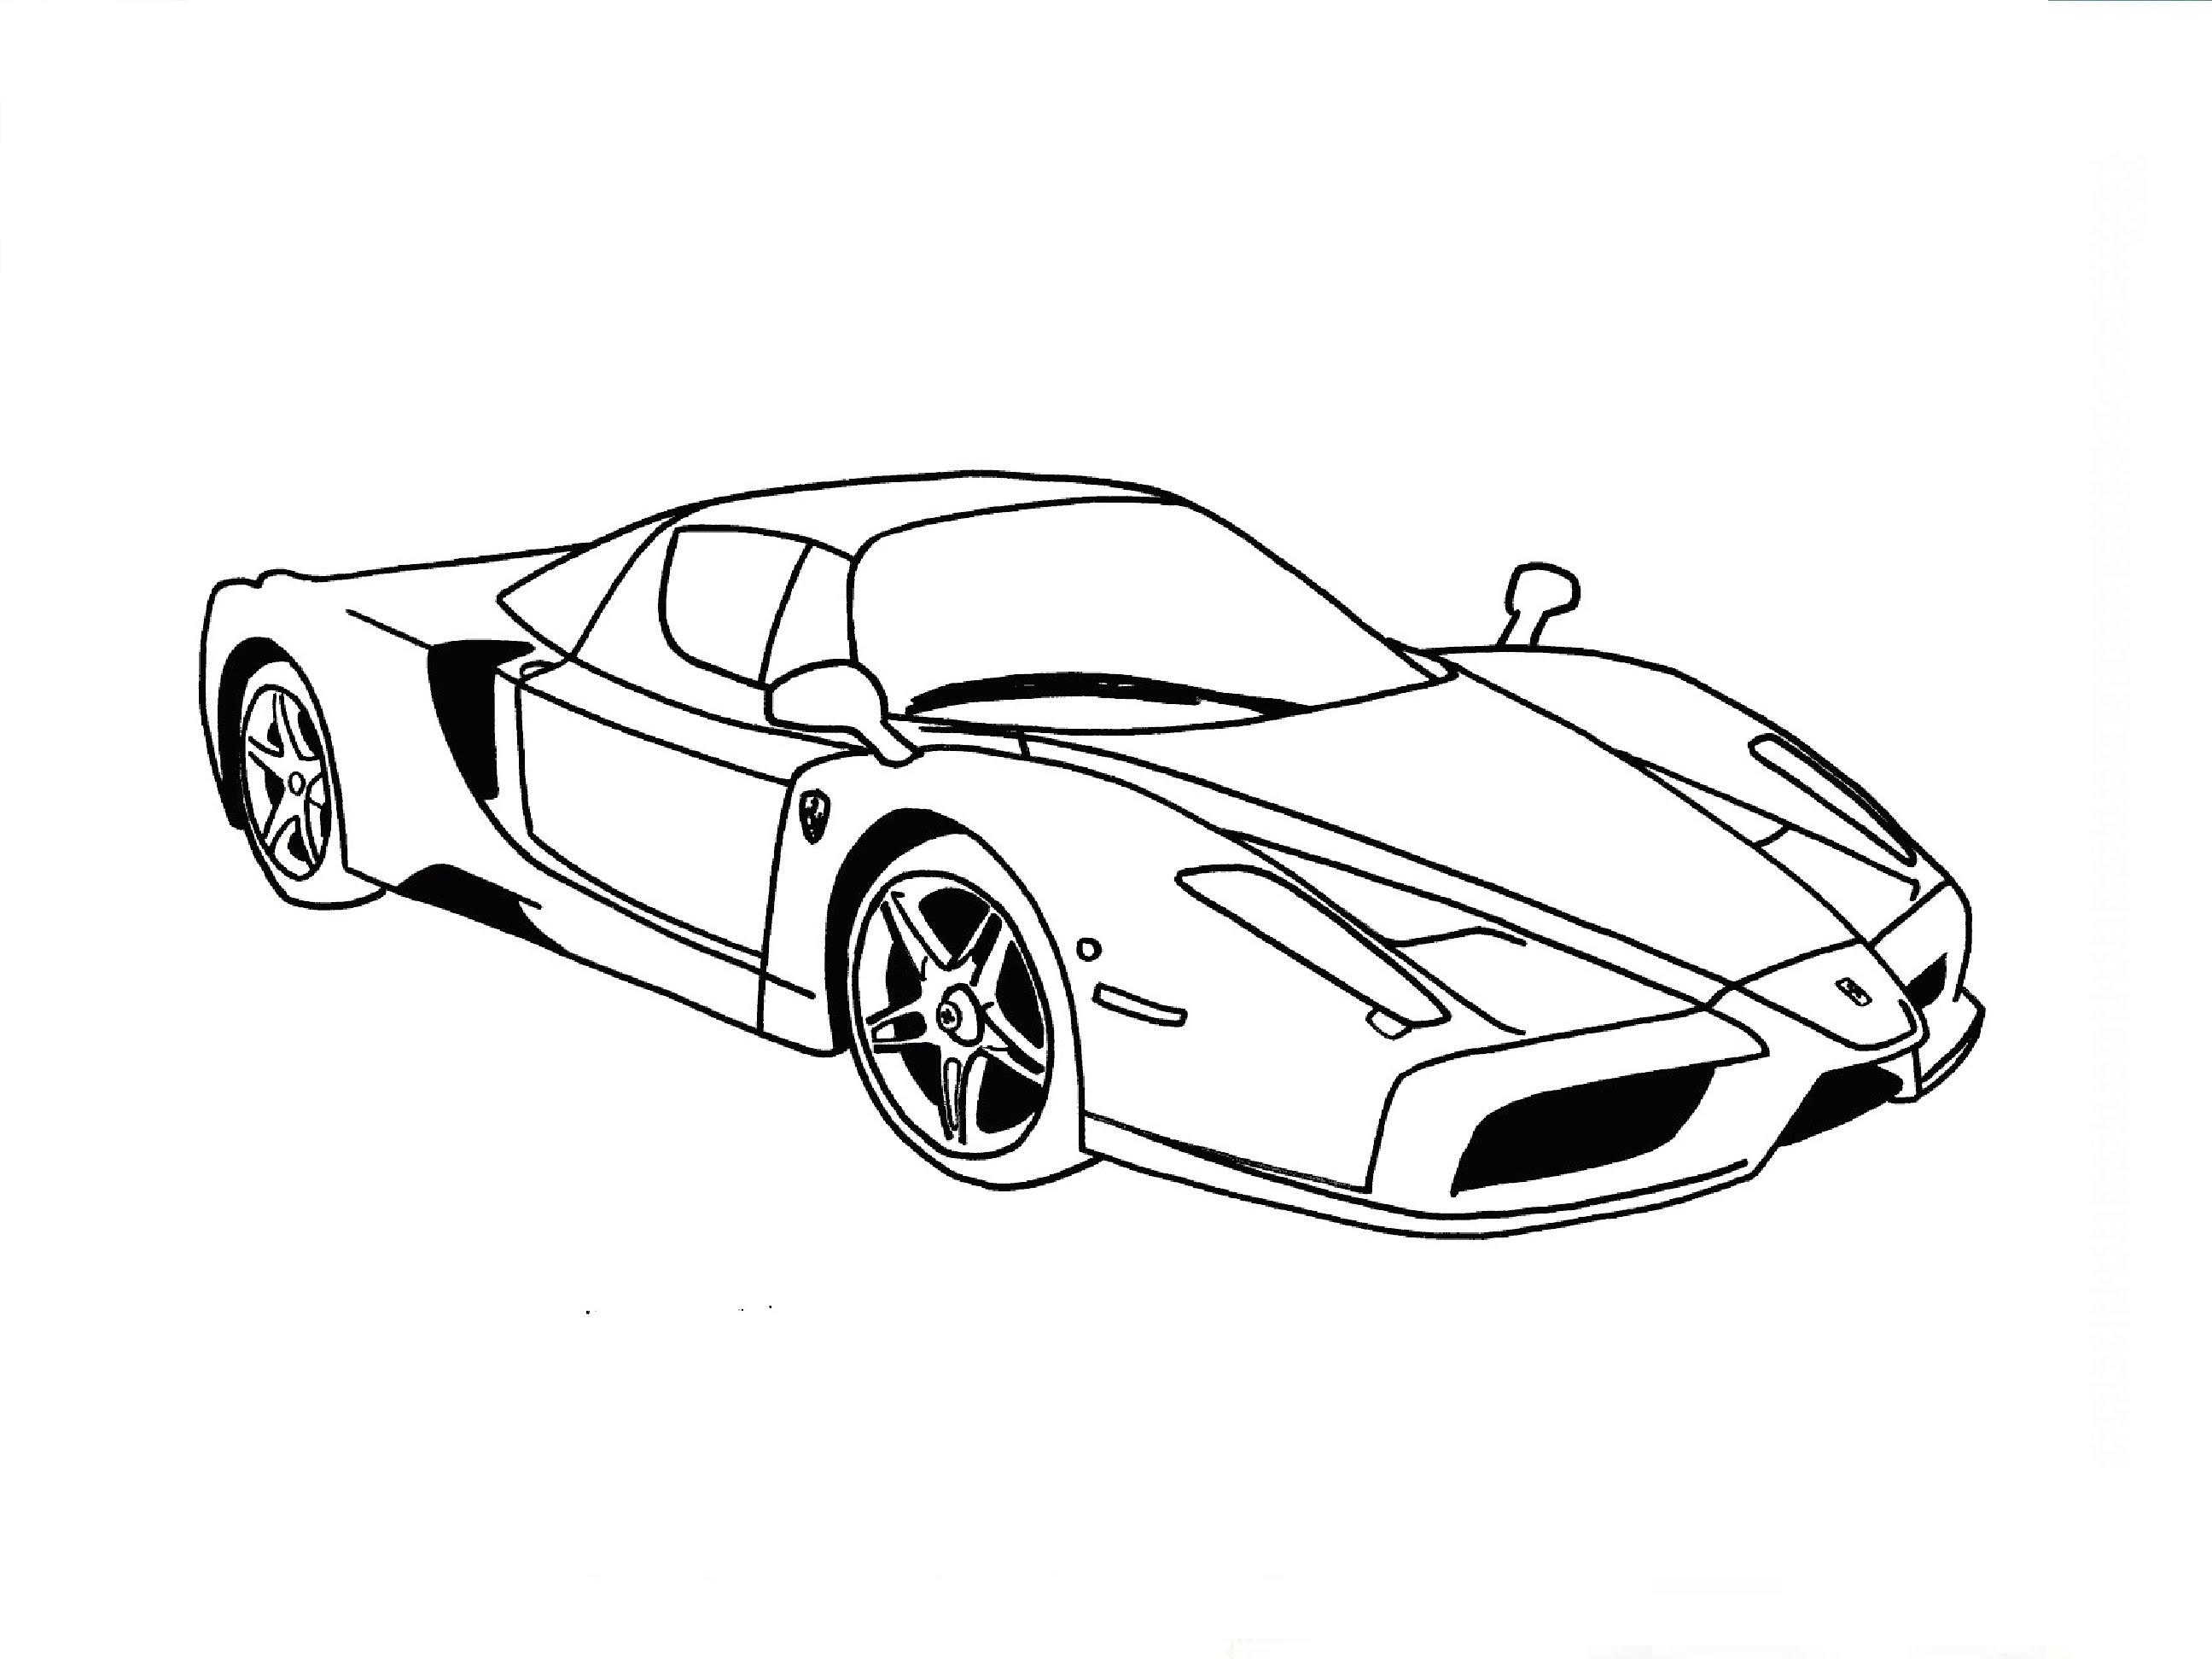 Nissan Gtr R35 Drawing At Getdrawings